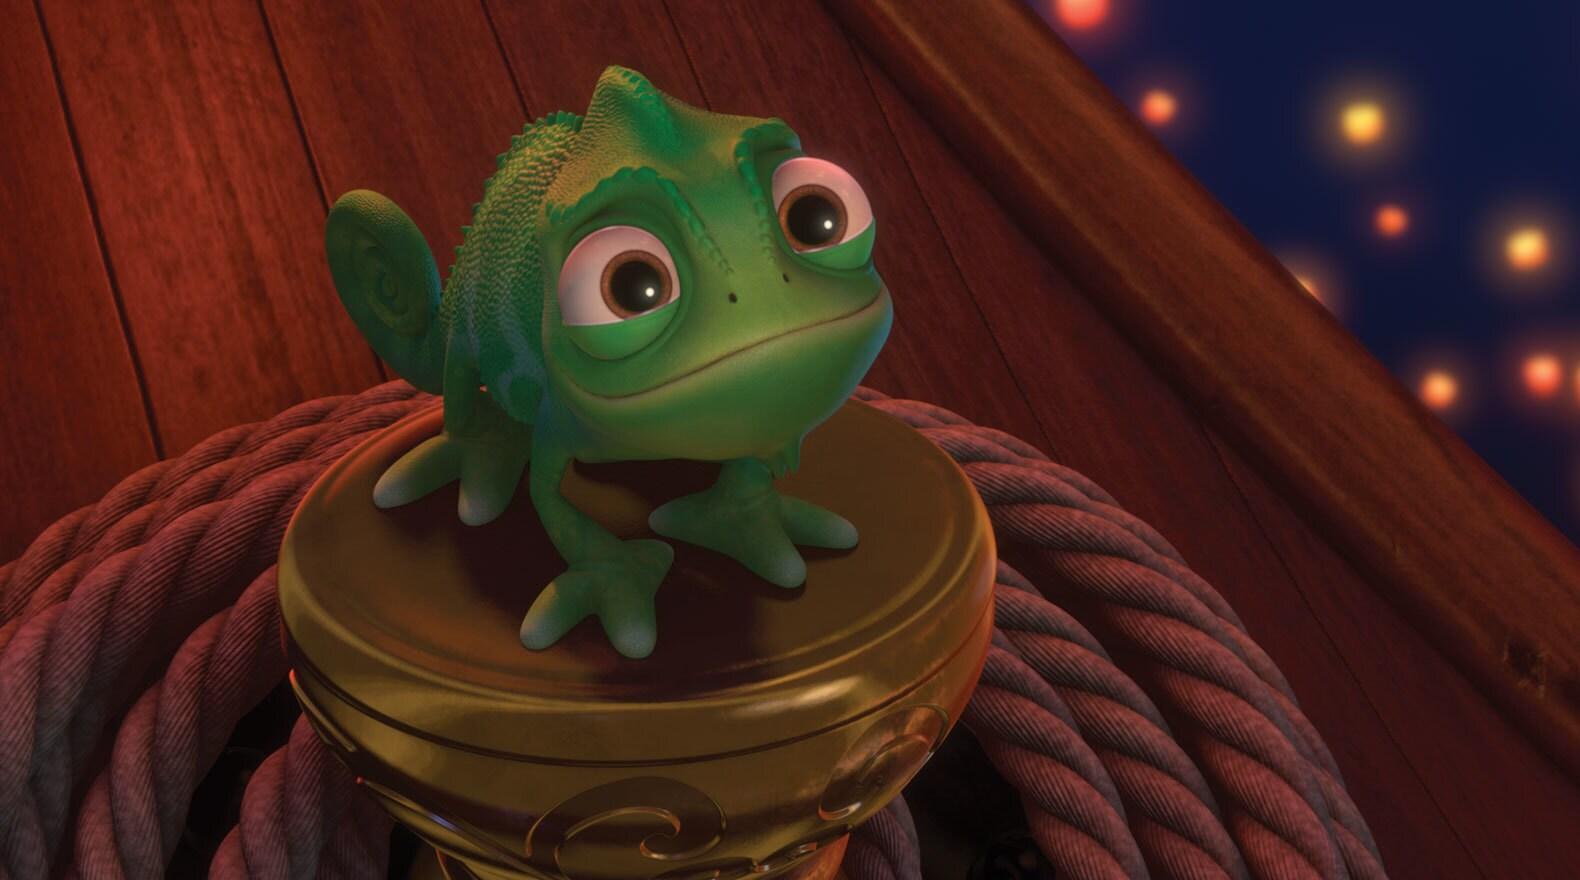 Pascal the chameleon